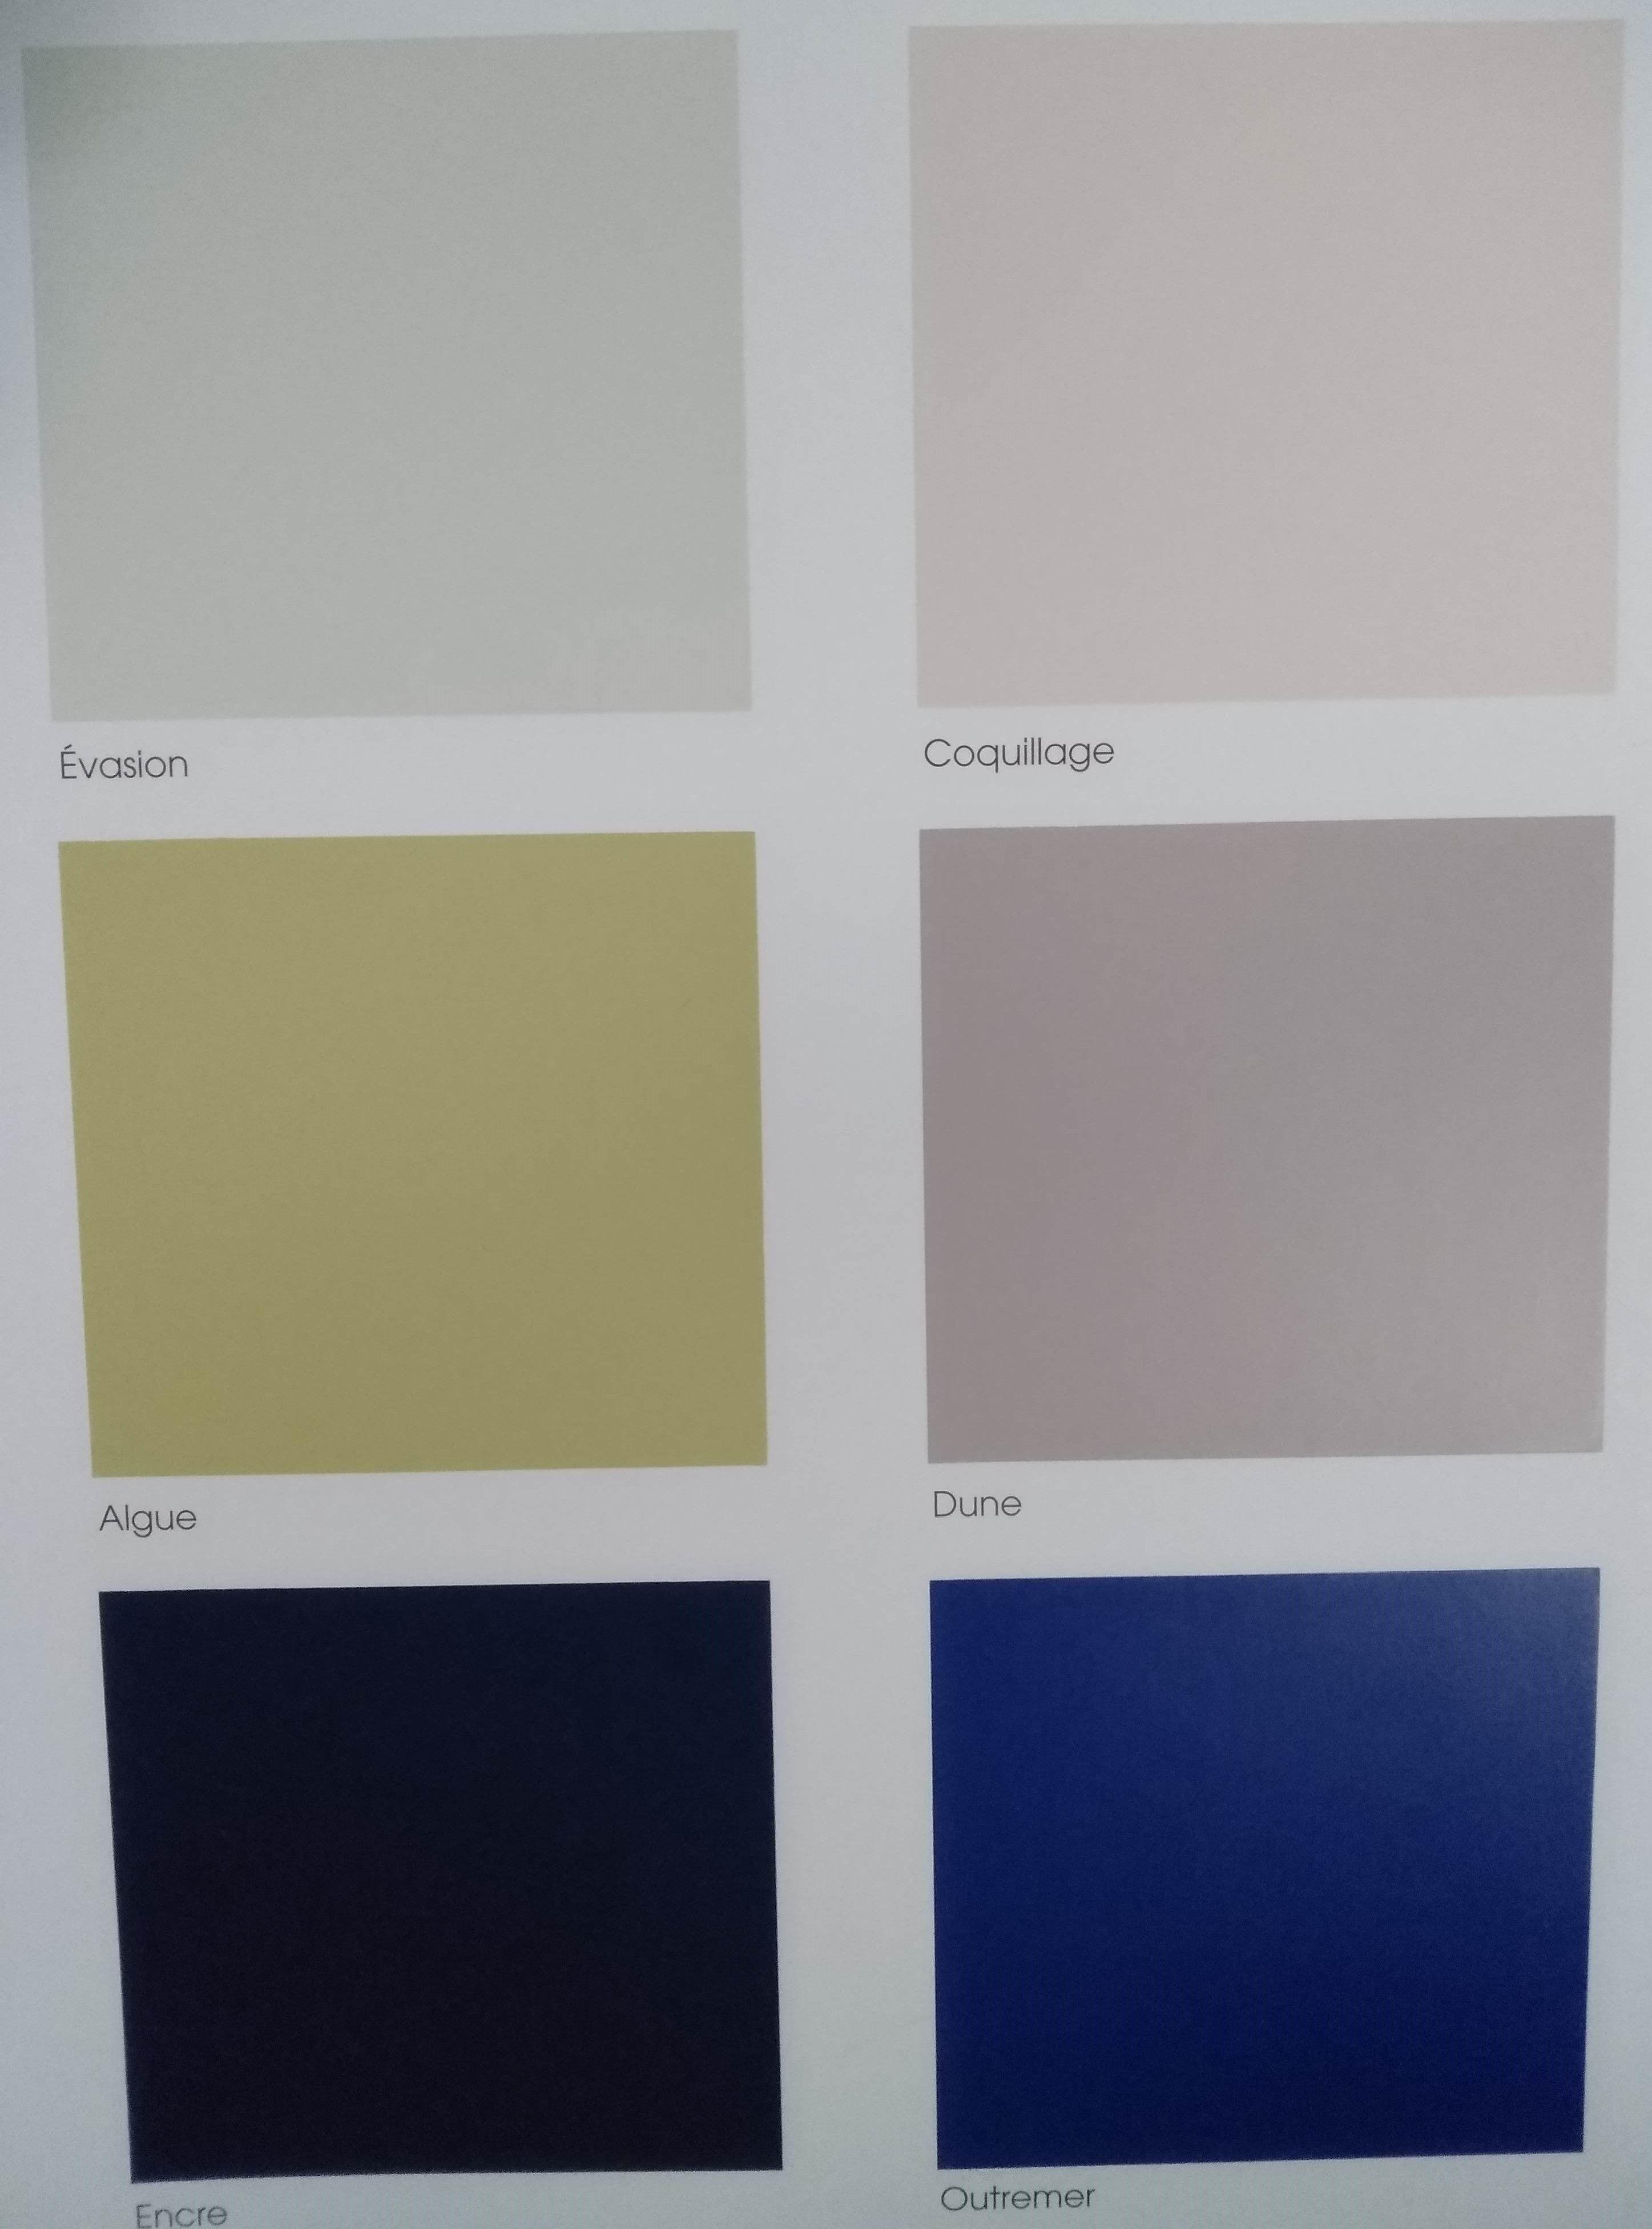 Peintures Zolpan Bleu Canard Zolpan B130 5 Me Me Y 19 Peinture Zolpan Peinture Bleu Canard Deco Maison